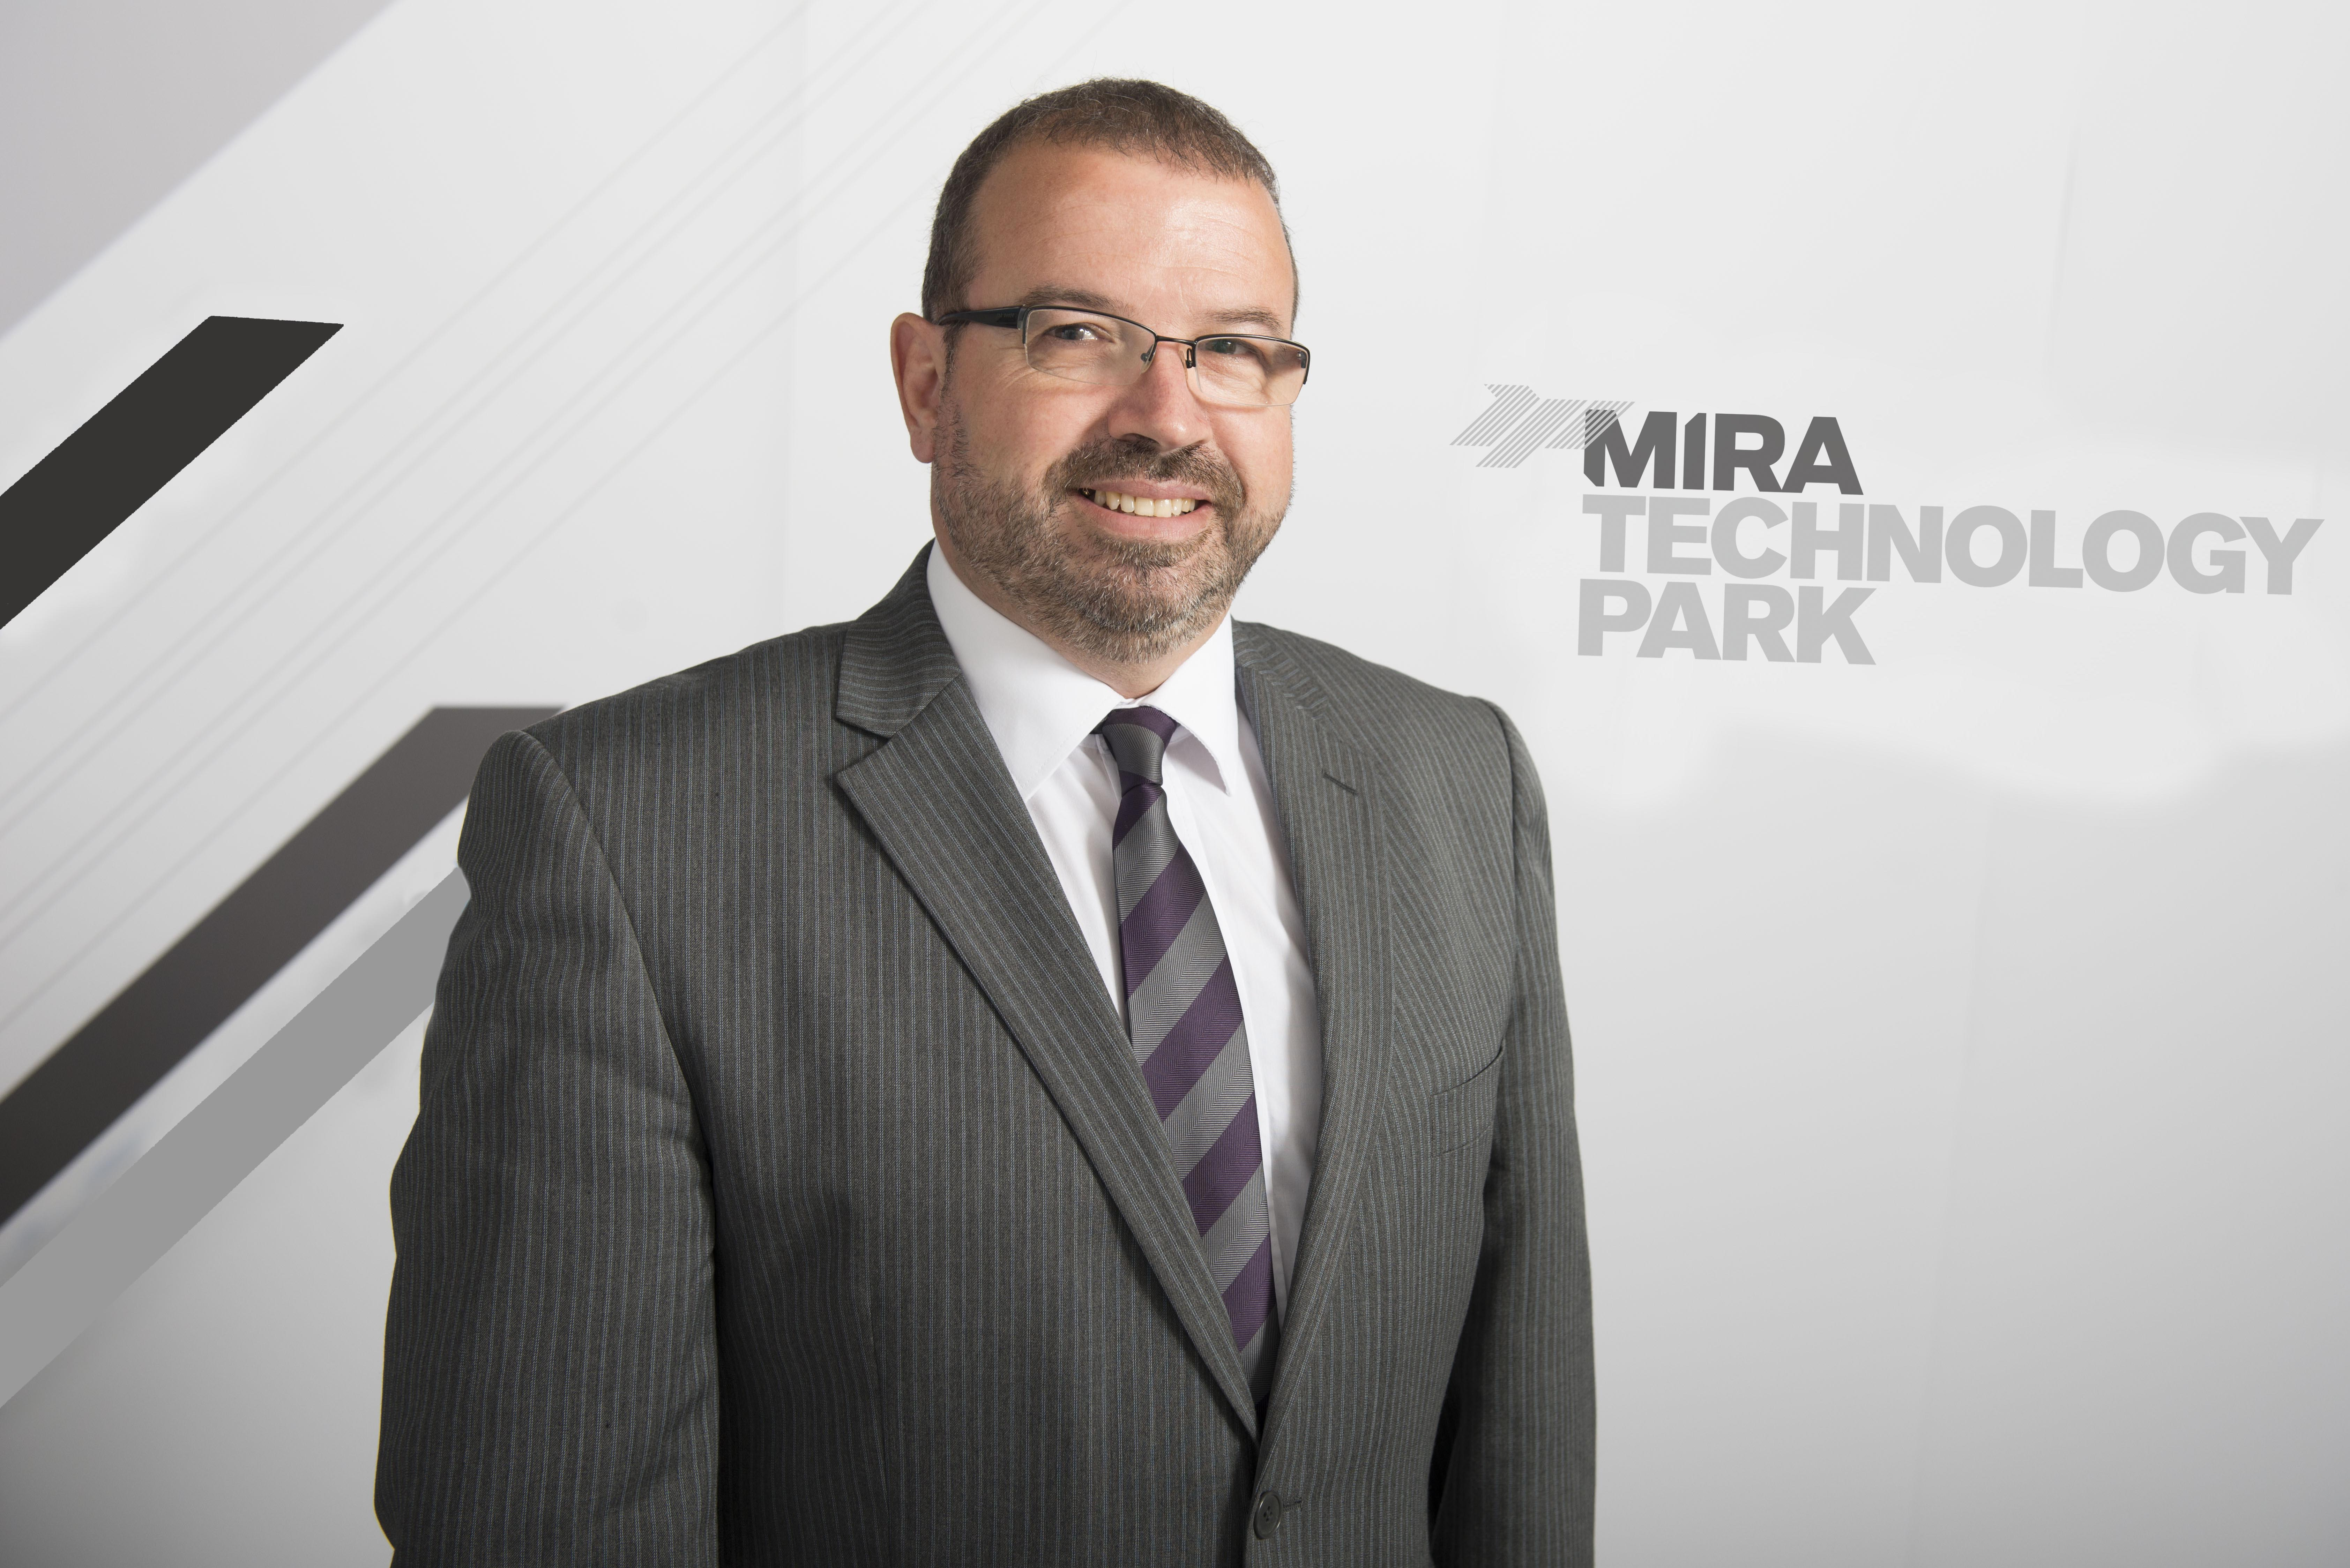 Dave Hockton of MIRA Technology Park